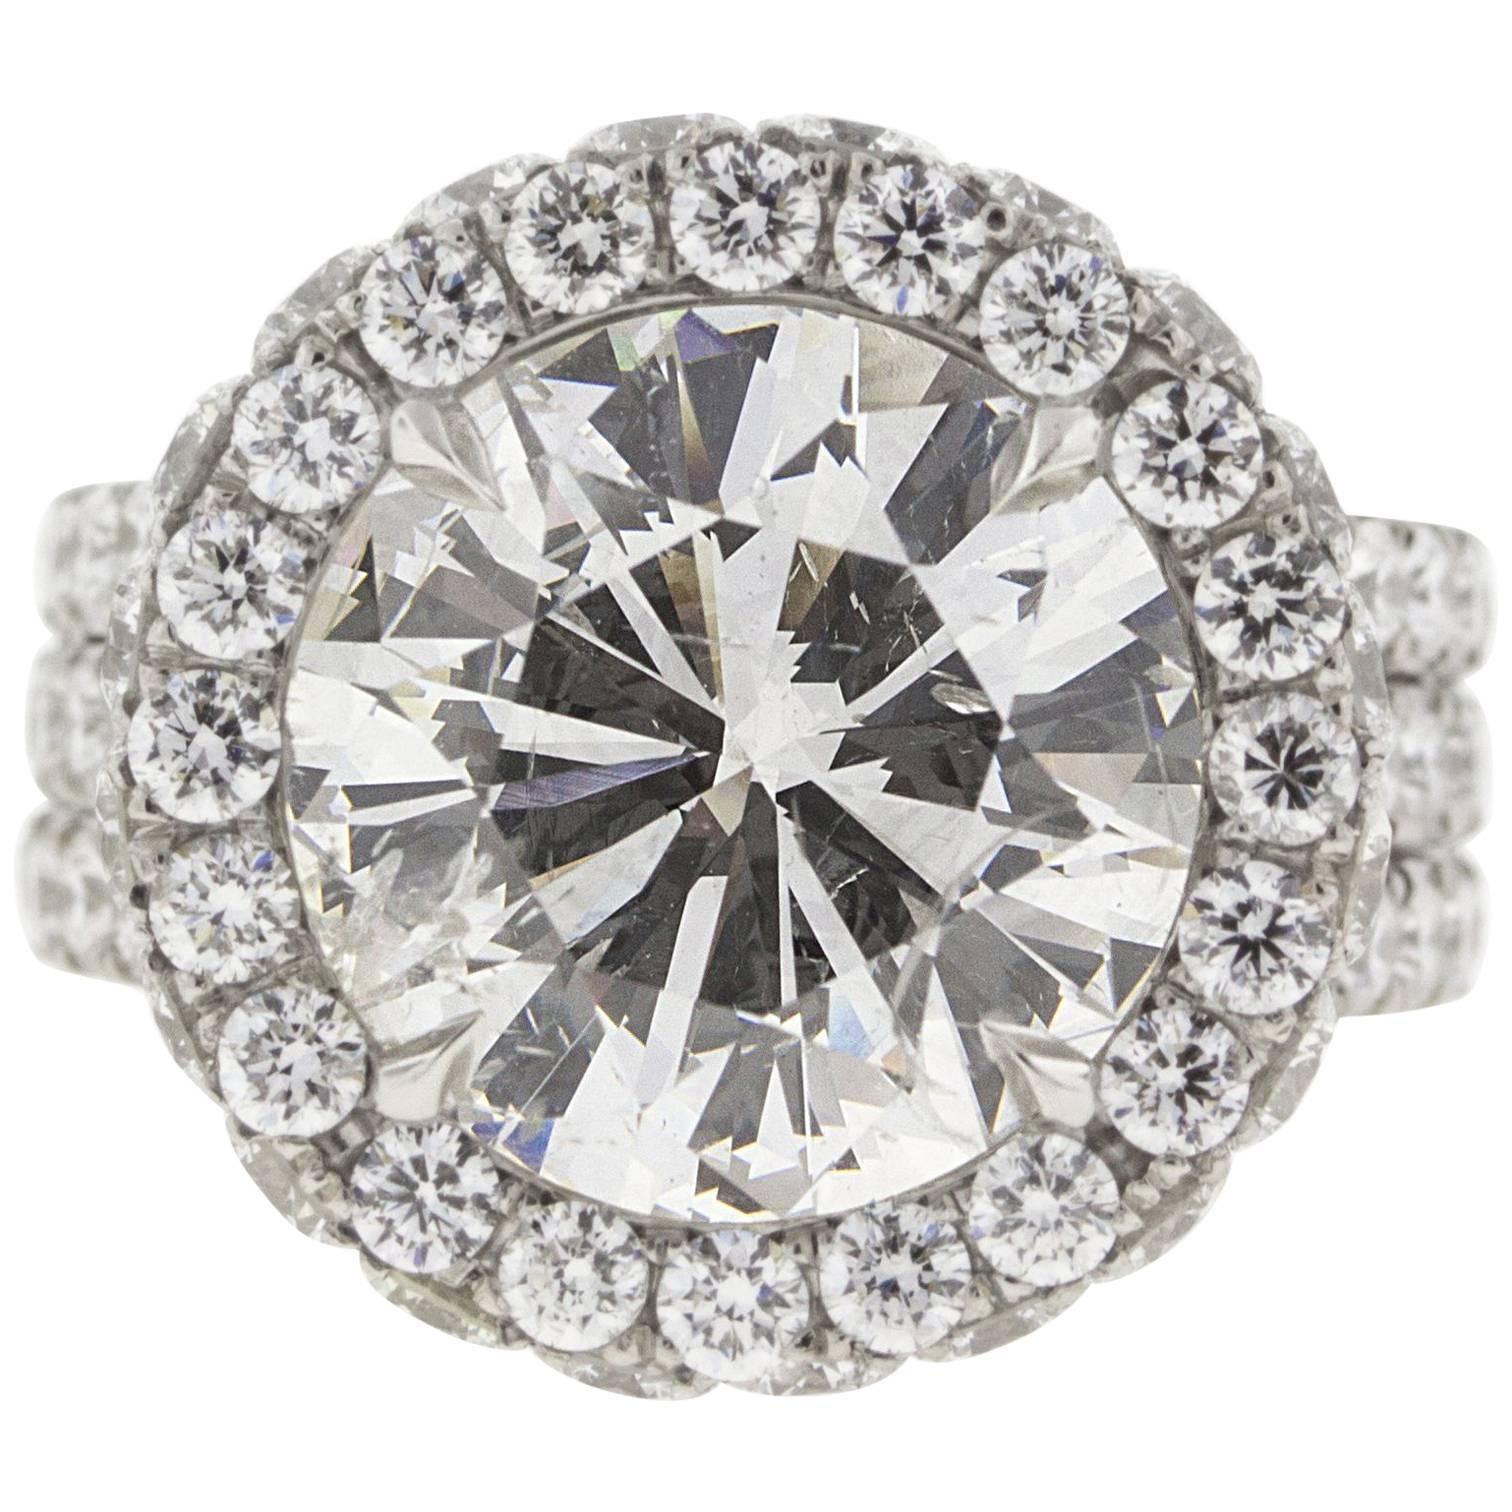 5 Carat Custom Diamond and Platinum Engagement Ring (GIA)